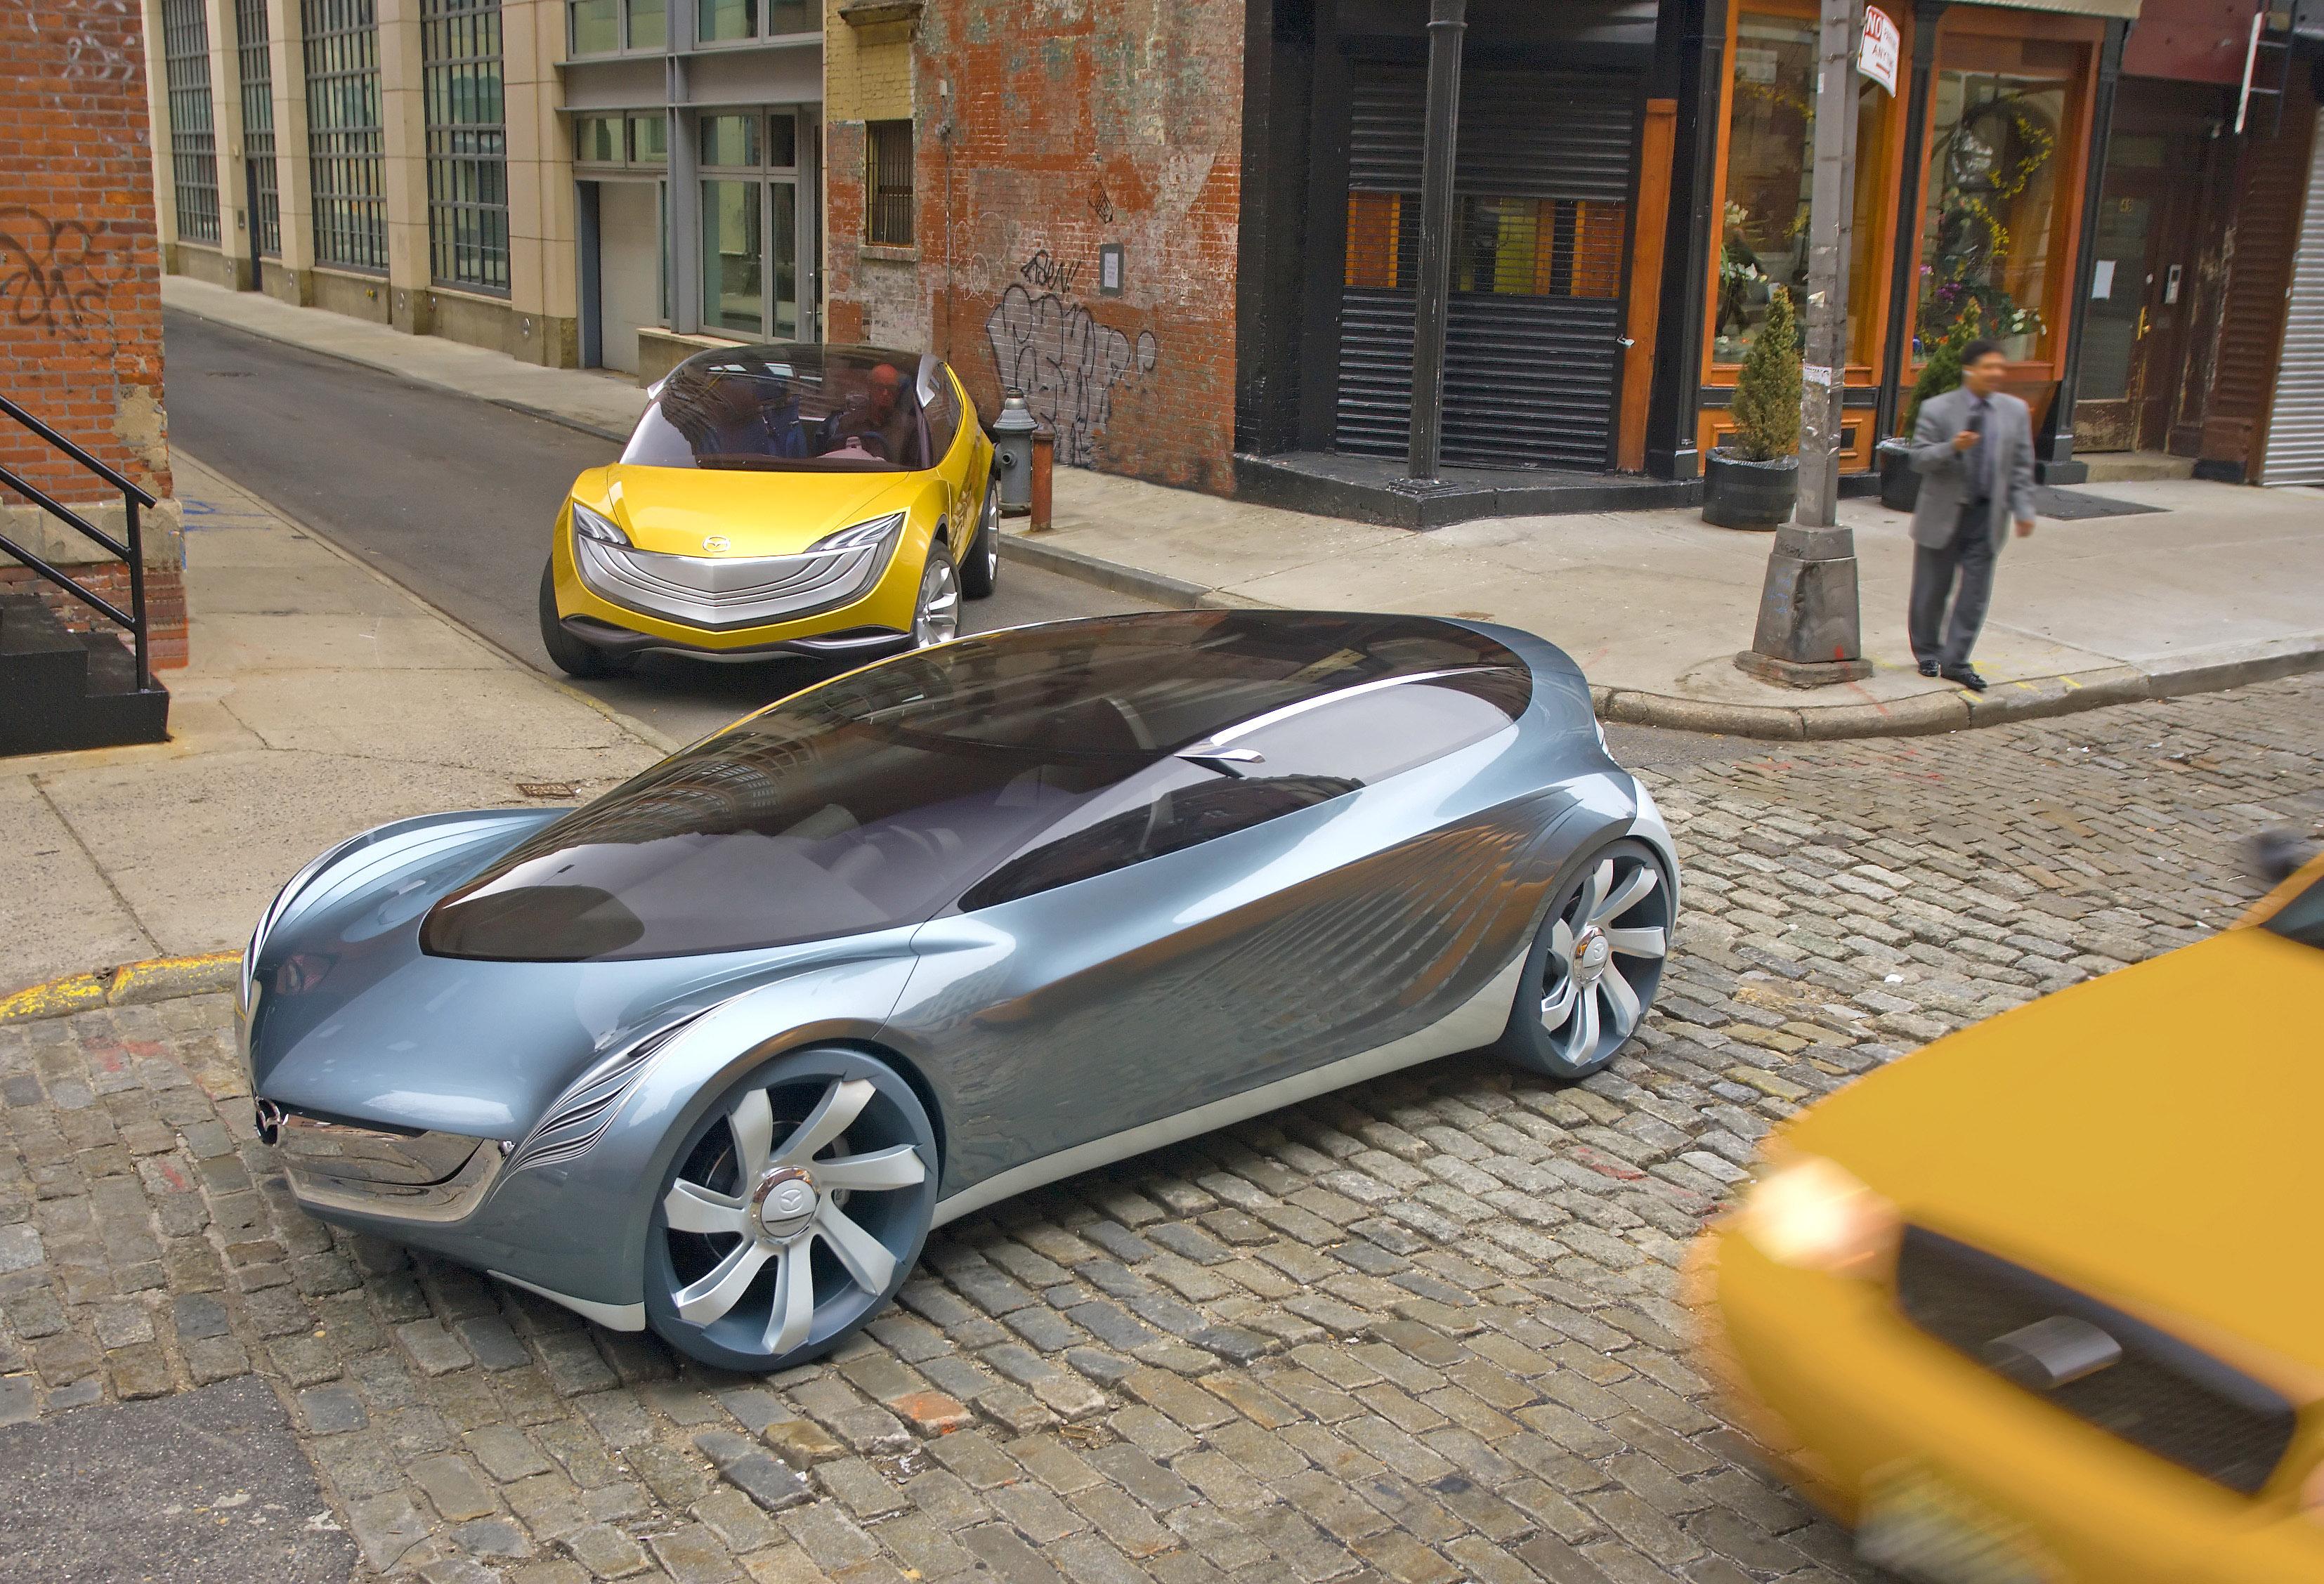 https://www.automobilesreview.com/gallery/mazda-hakaze-concept/mazda-hakaze-concept-06.jpg